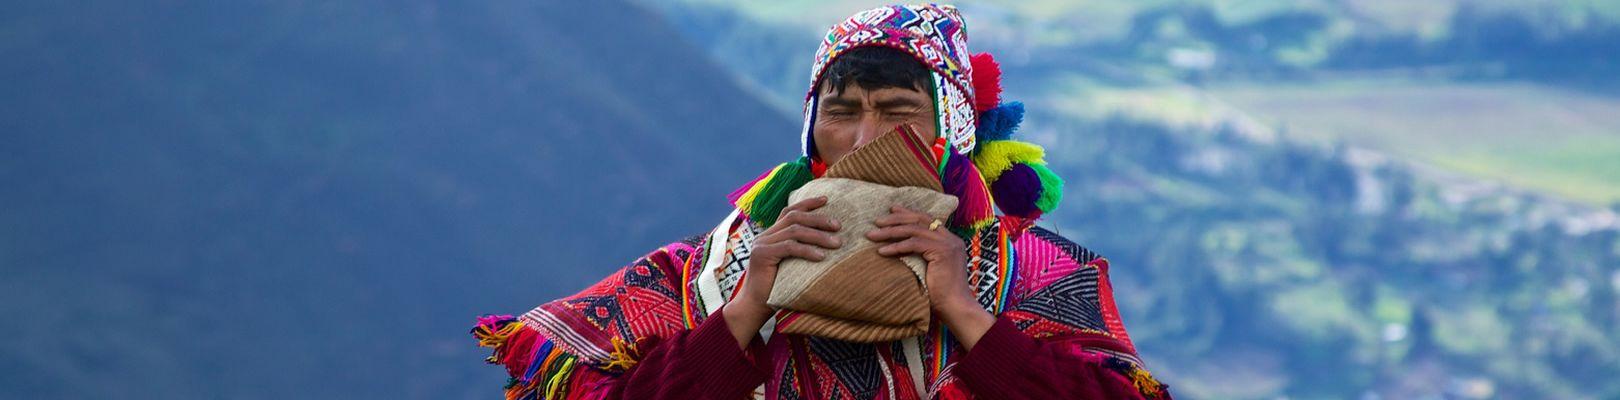 musicien-andin-cuzco